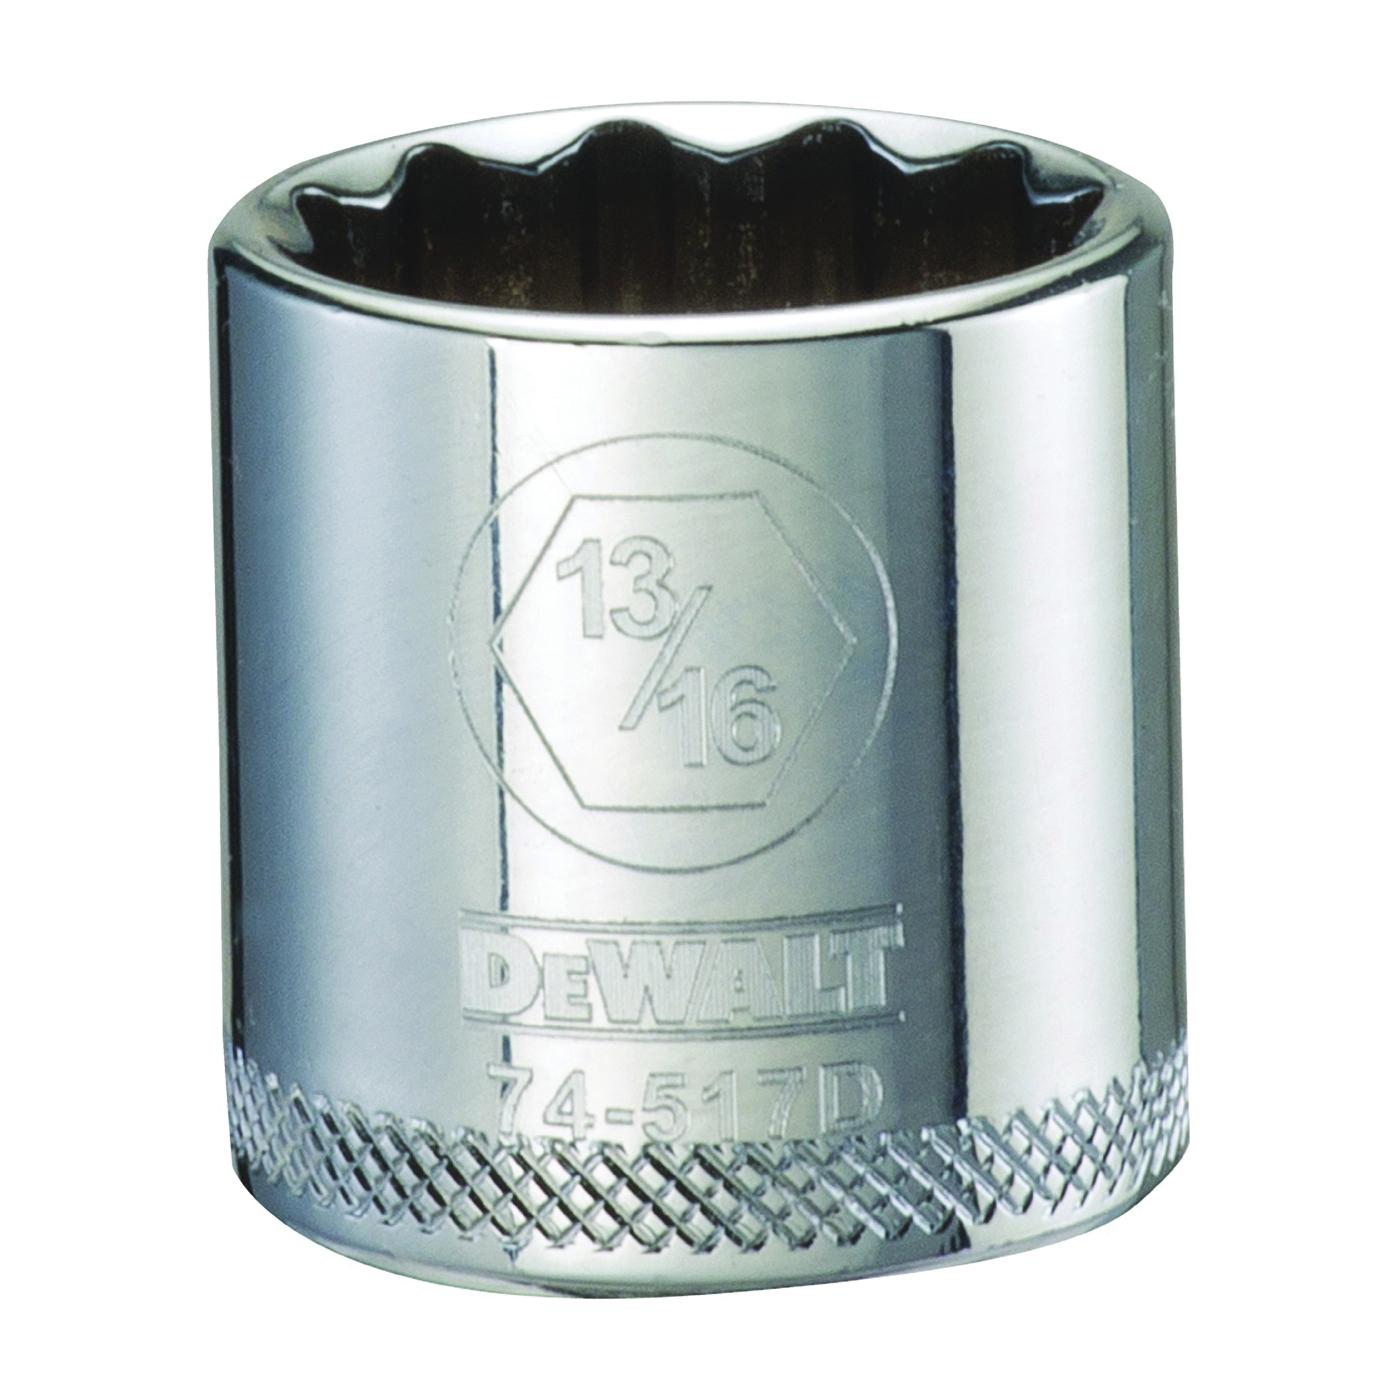 Picture of DeWALT DWMT74517OSP Hand Socket, 13/16 in Socket, 3/8 in Drive, 12 -Point, Vanadium Steel, Polished Chrome